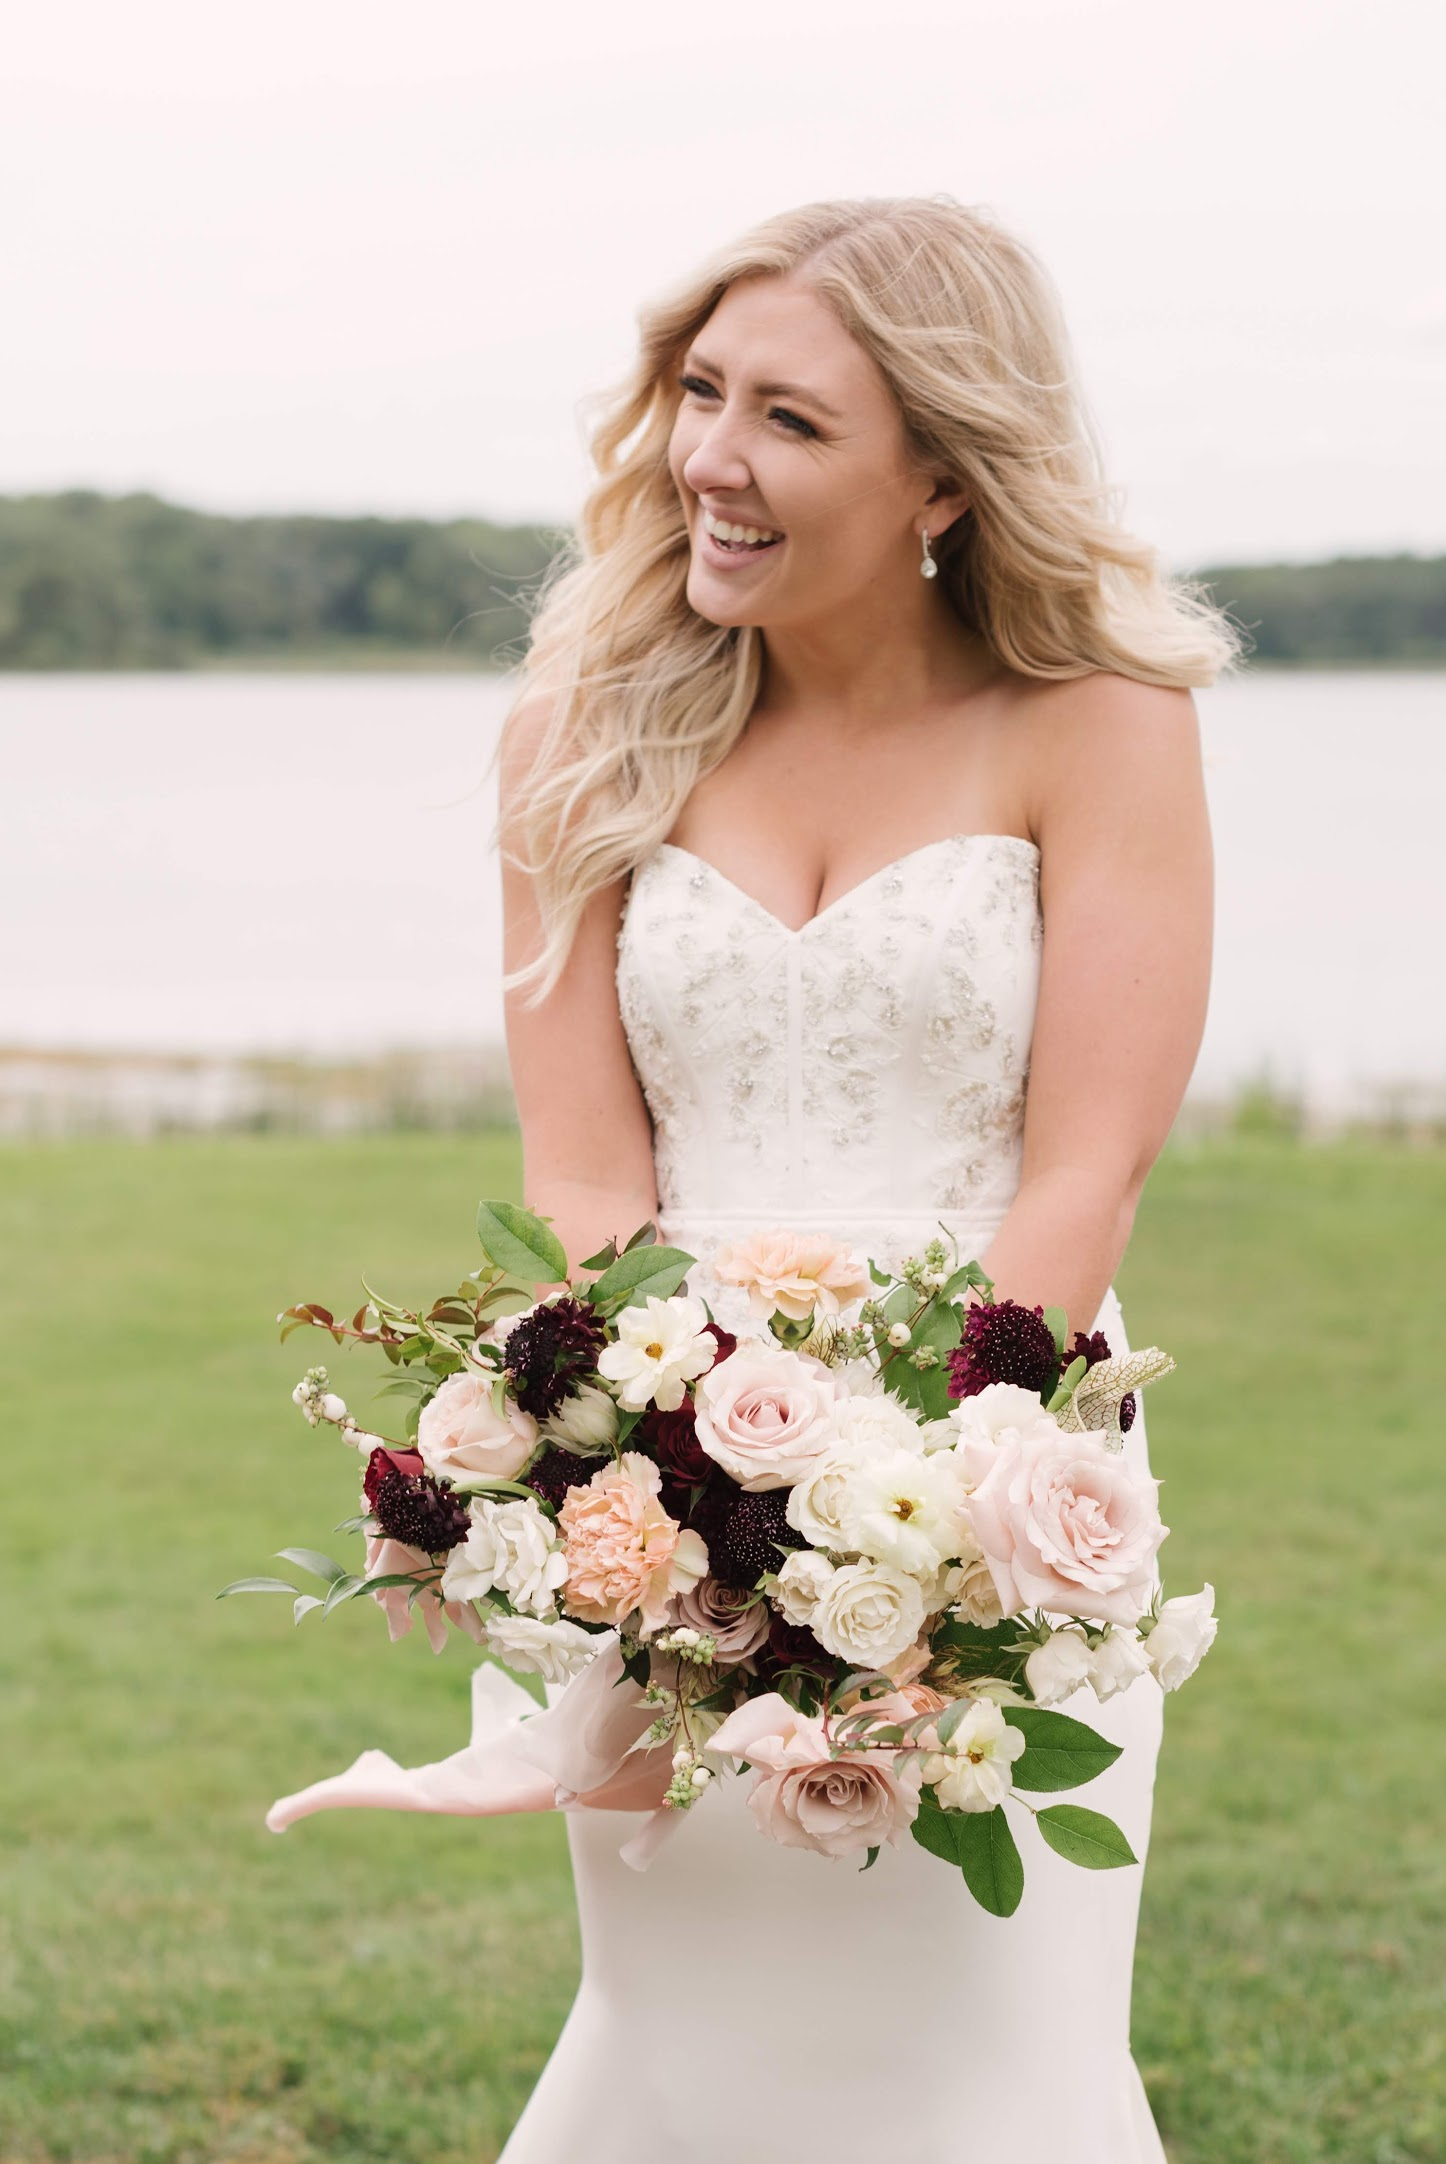 Field-Gems-Photography-Detroit-Michigan-Wedding-Photographer-Family-Photographer-Photobooth-090818-418.jpg